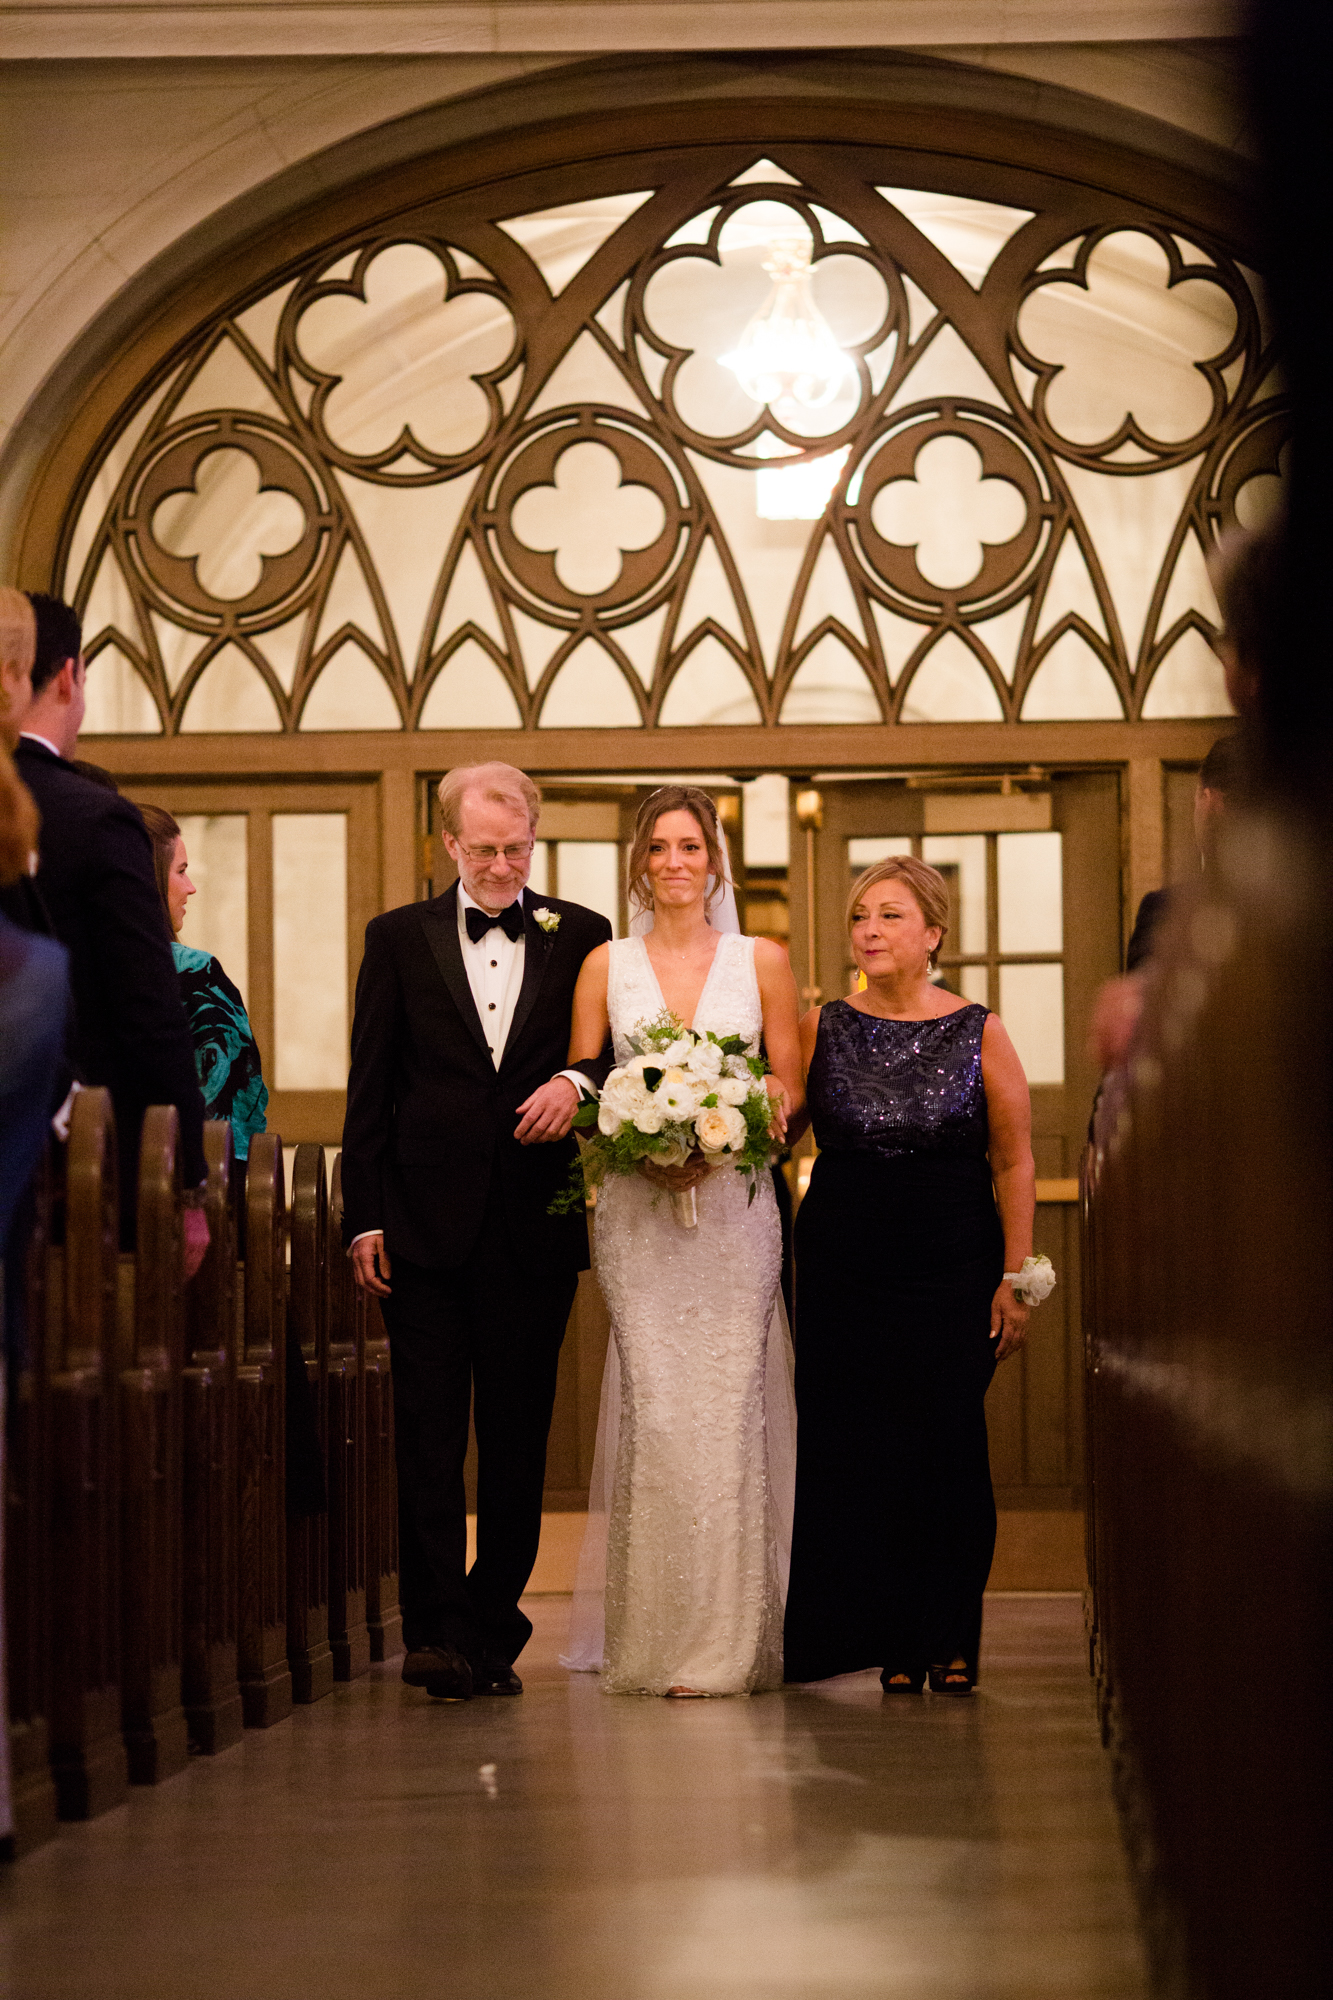 Bride walks down the aisle at St James Chapel wedding ceremony.